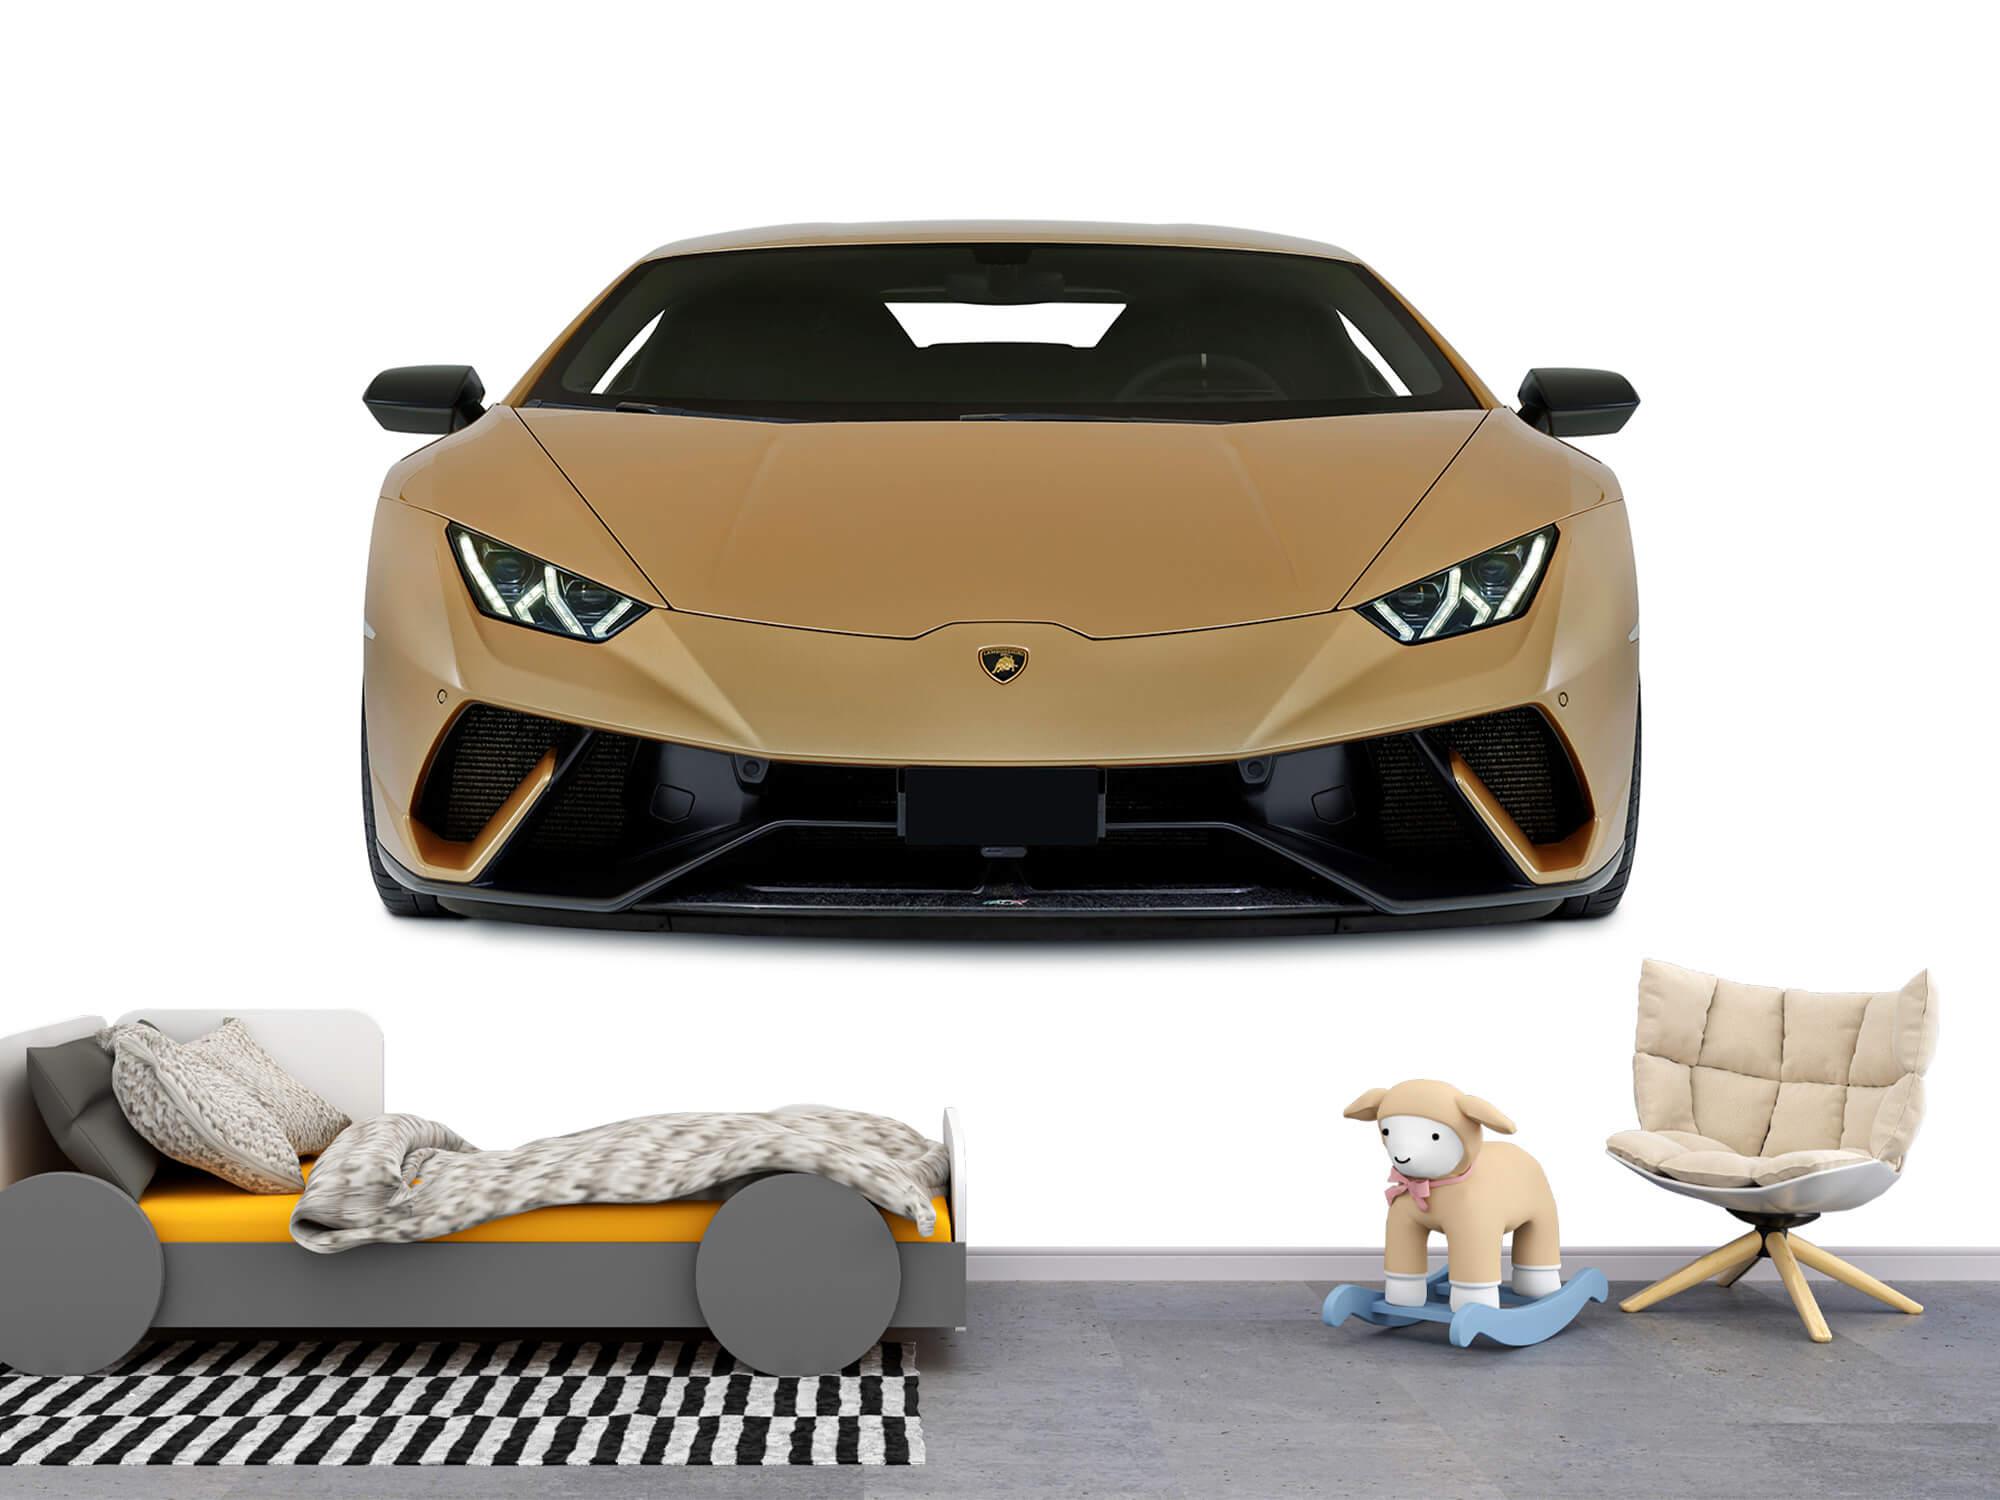 Wallpaper Lamborghini Huracán - Voorkant, wit 4